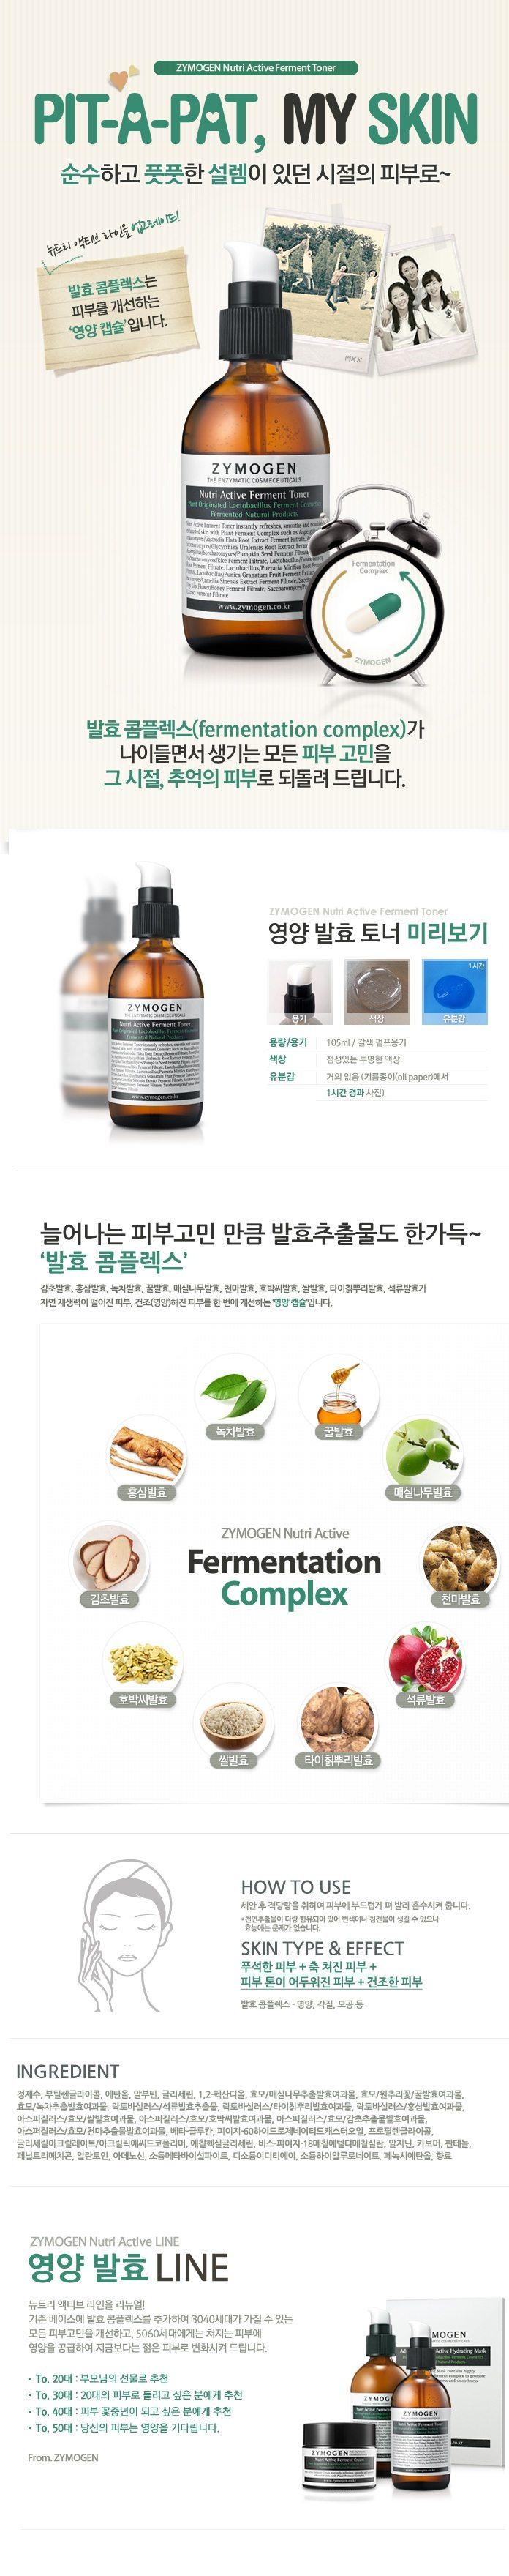 Zymogen Nutri Active Ferment Toner korean cosmetic skincar product online shop malaysia brazil macau1